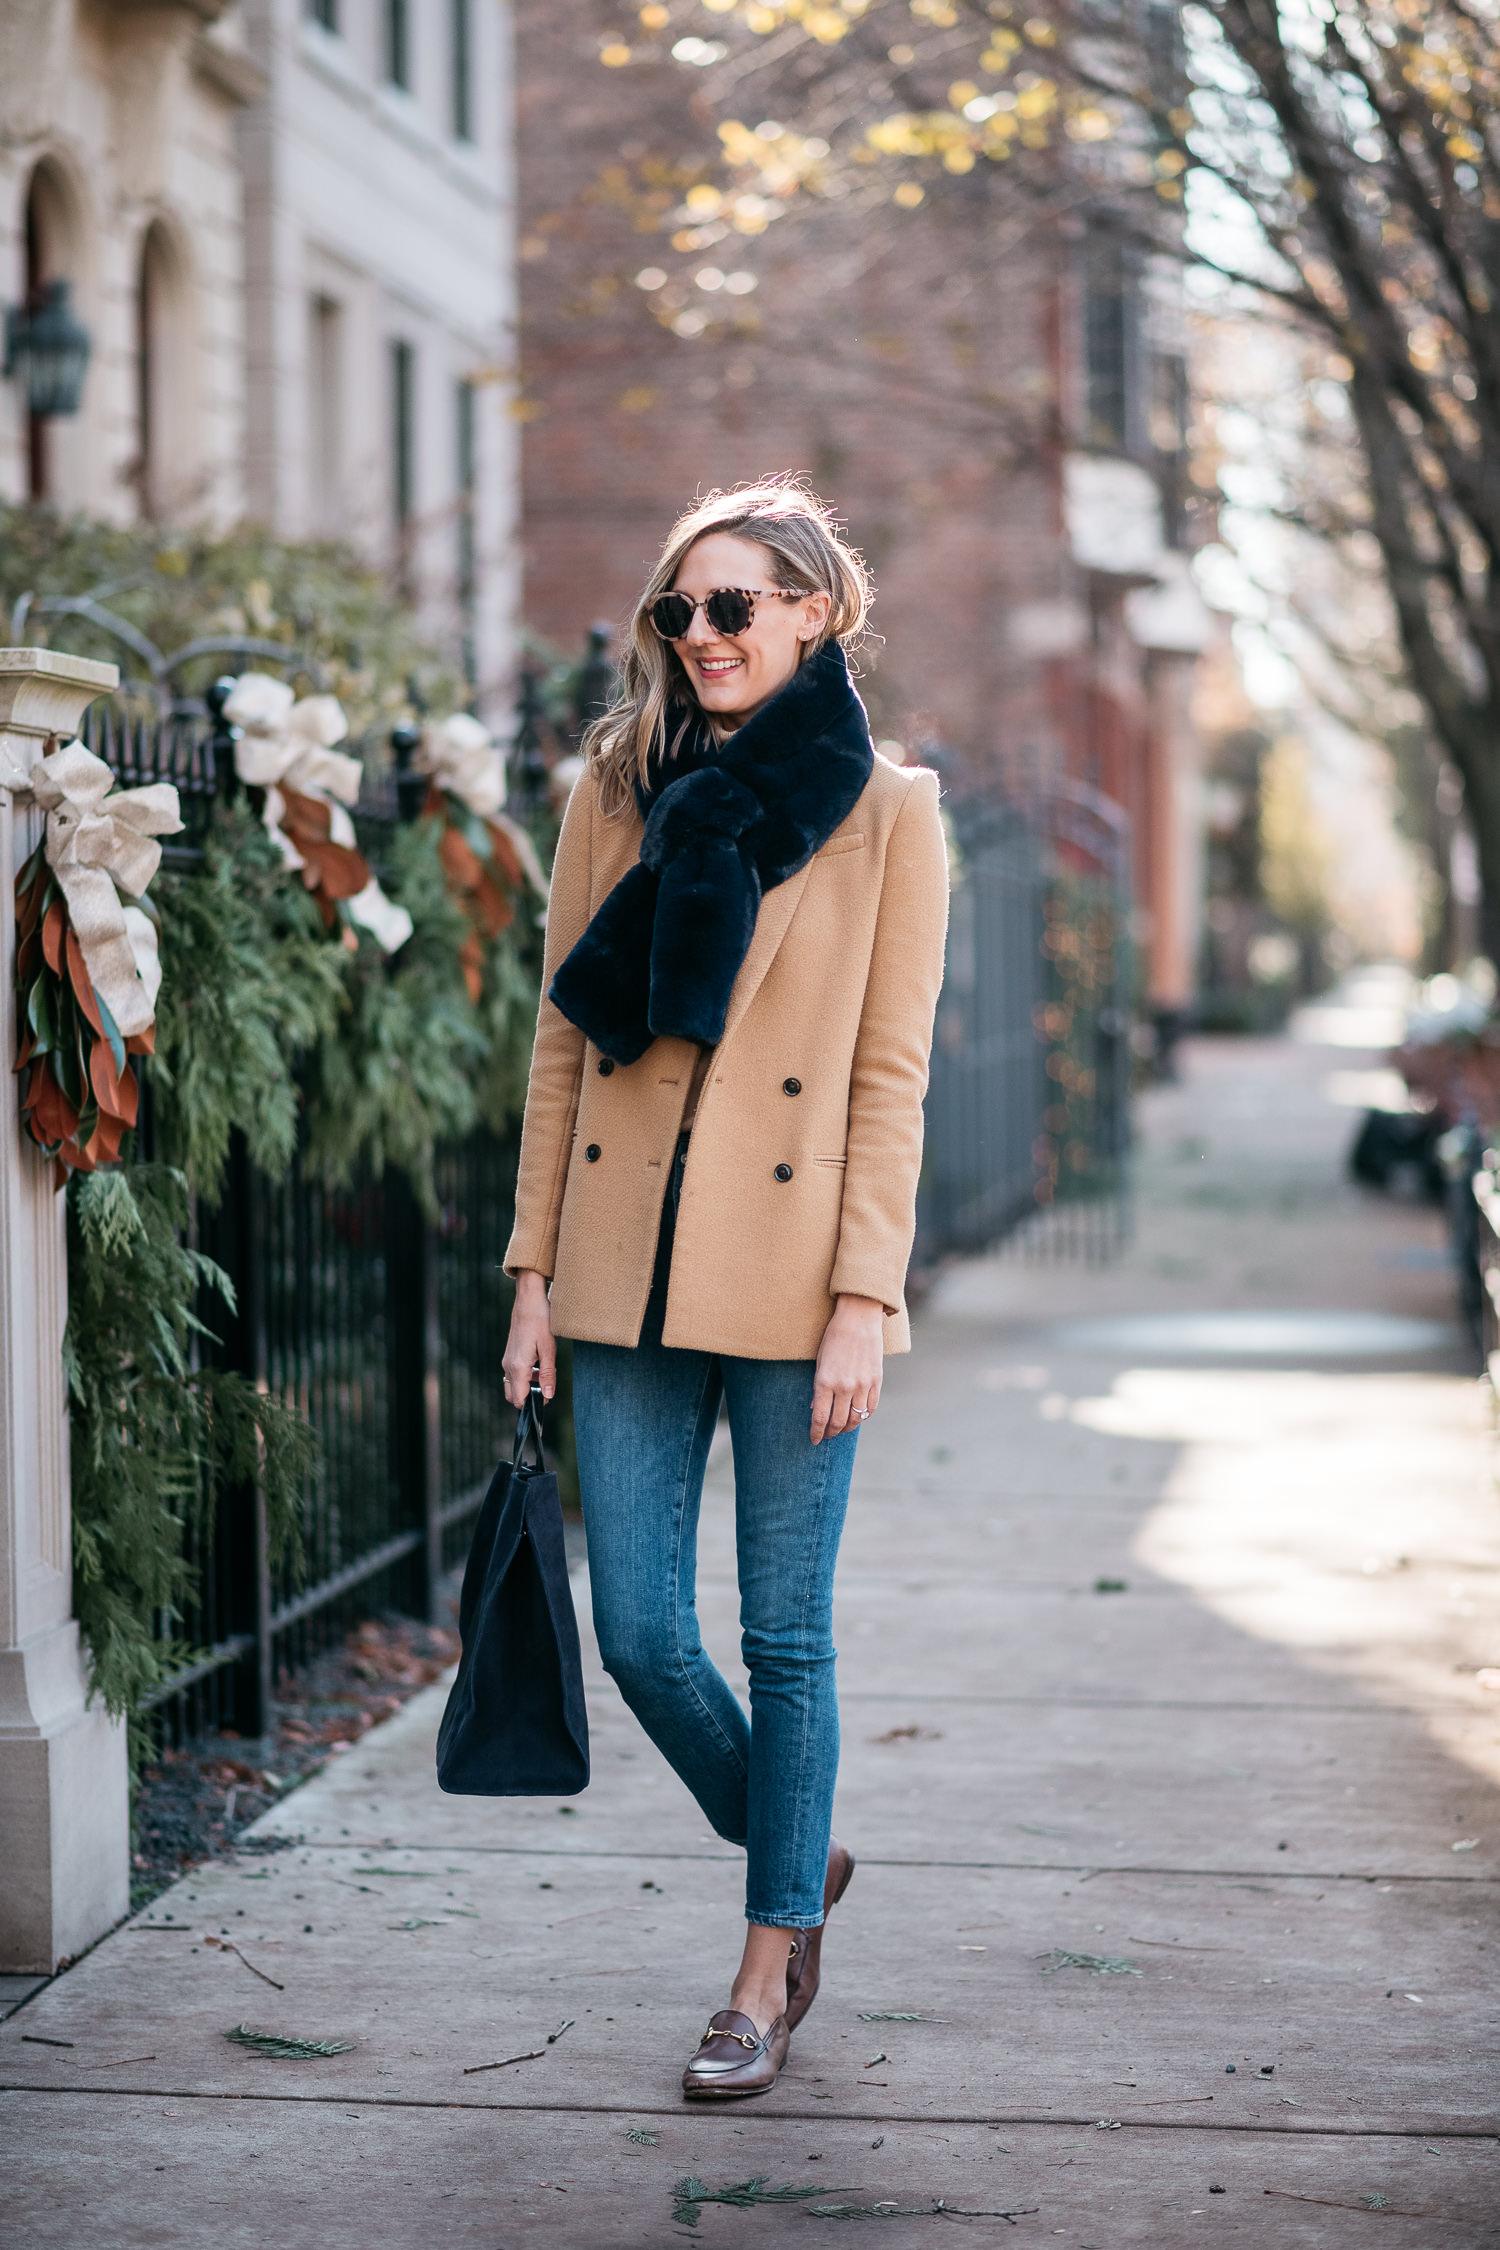 classic winter wardrobe essentials